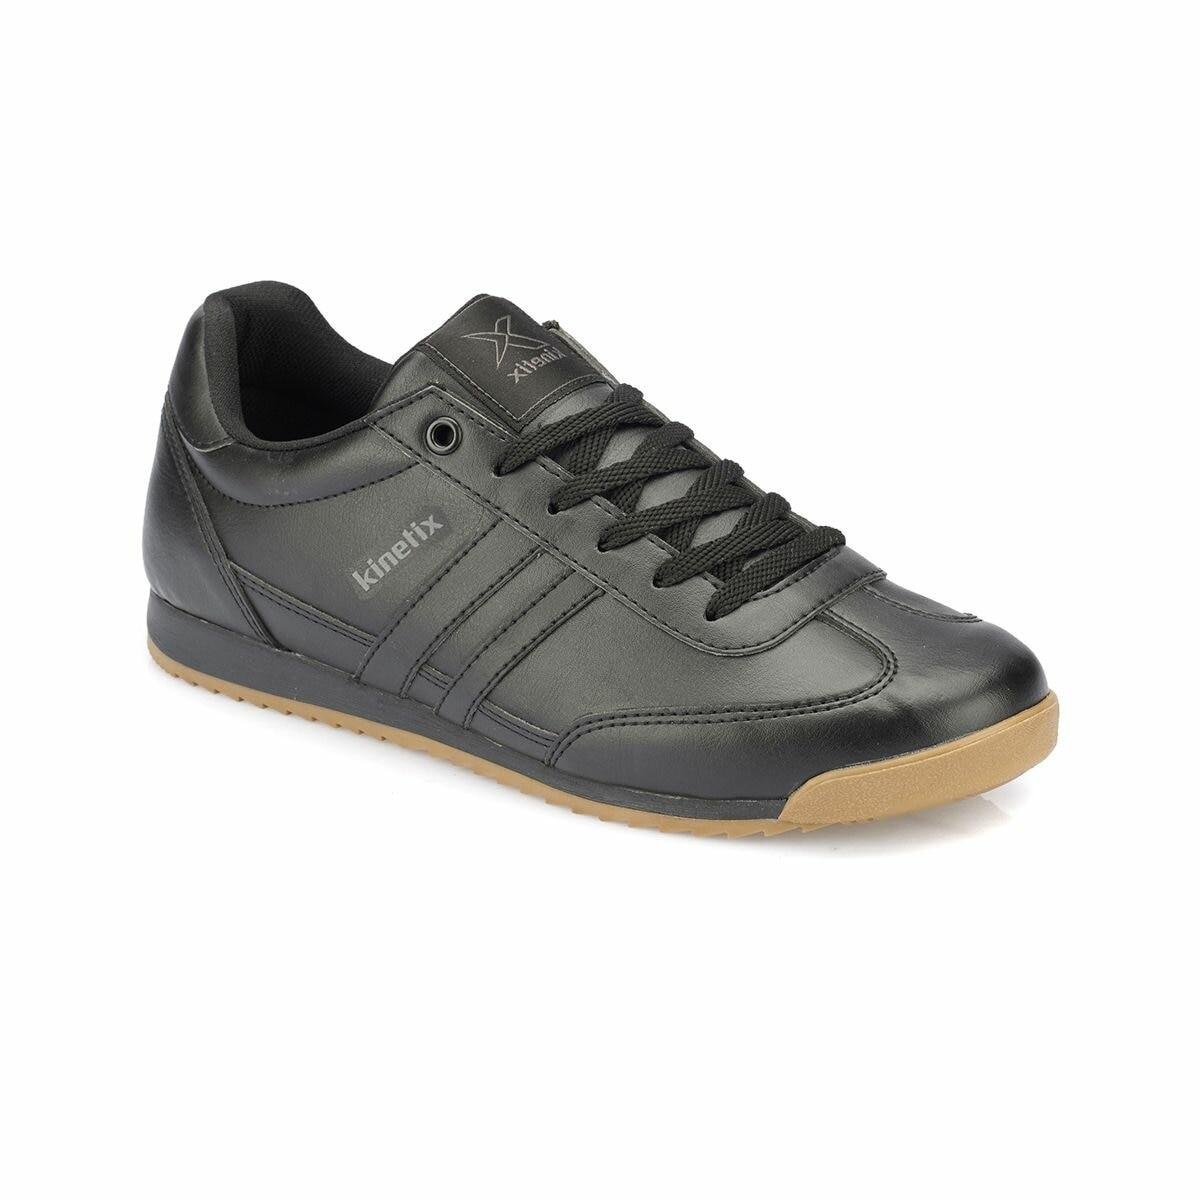 FLO HALLEY PU M Black Men 'S Sneaker Shoes KINETIX